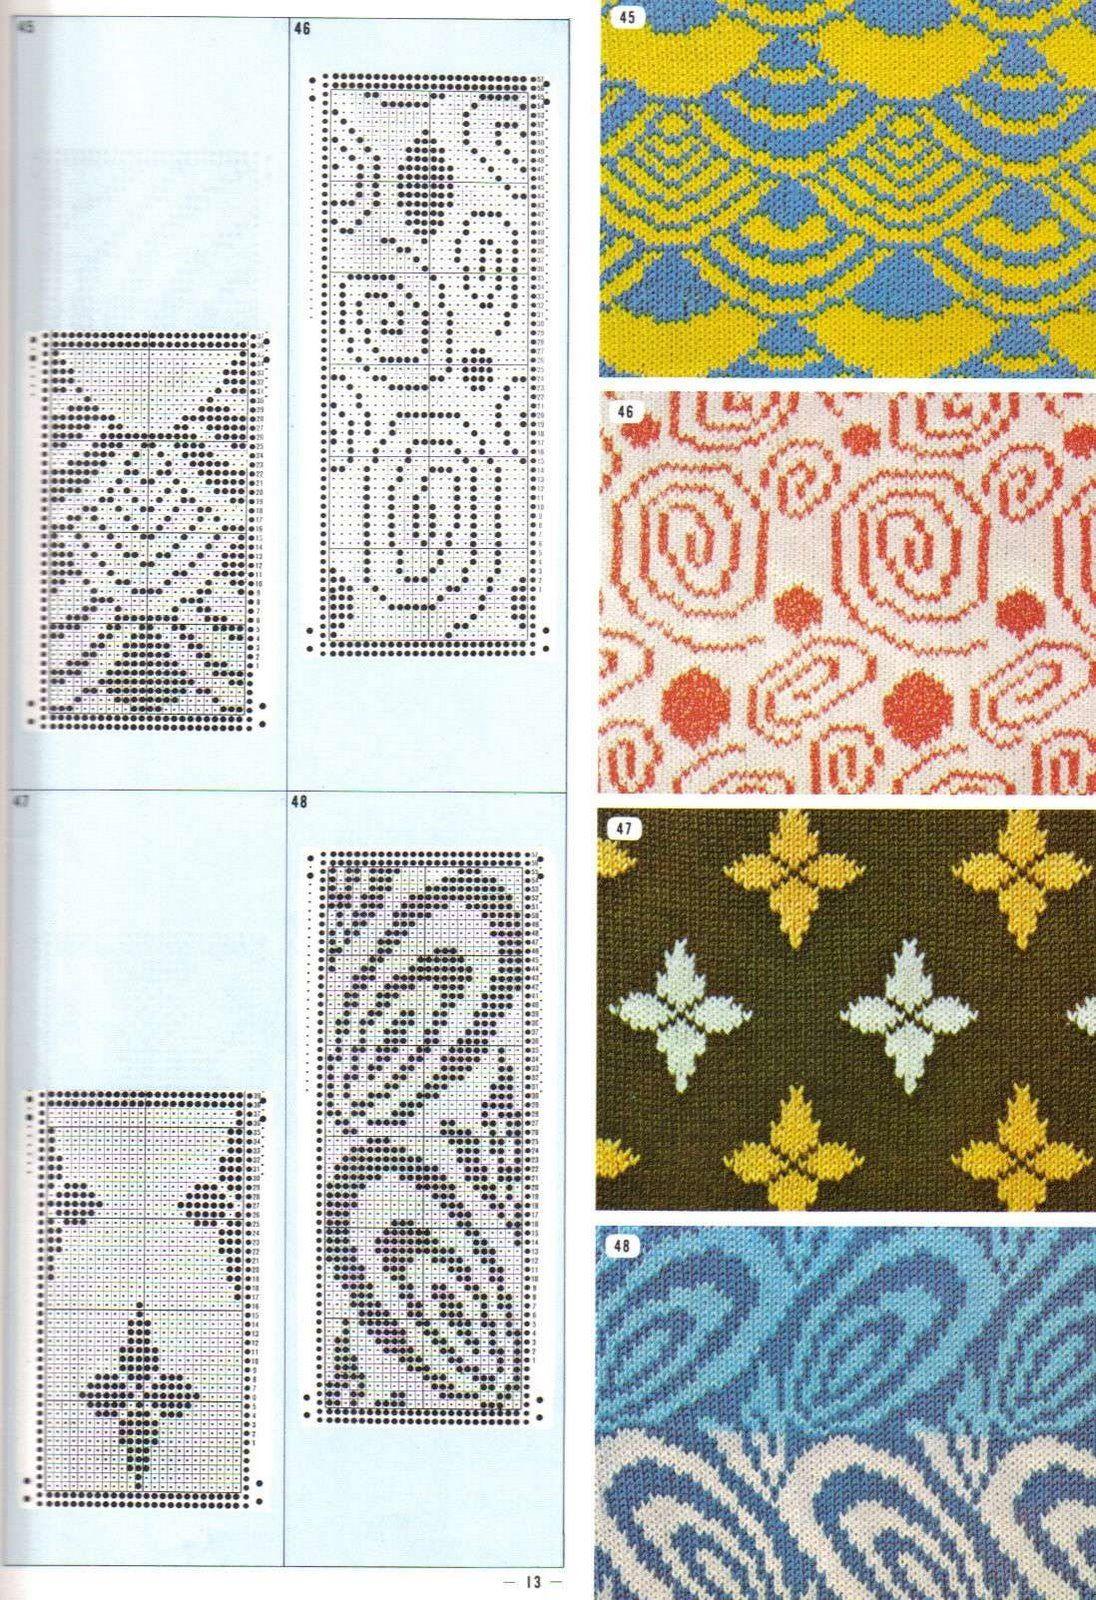 jaquard pattern   Strickmuster   Pinterest   Strickmuster, Stricken ...